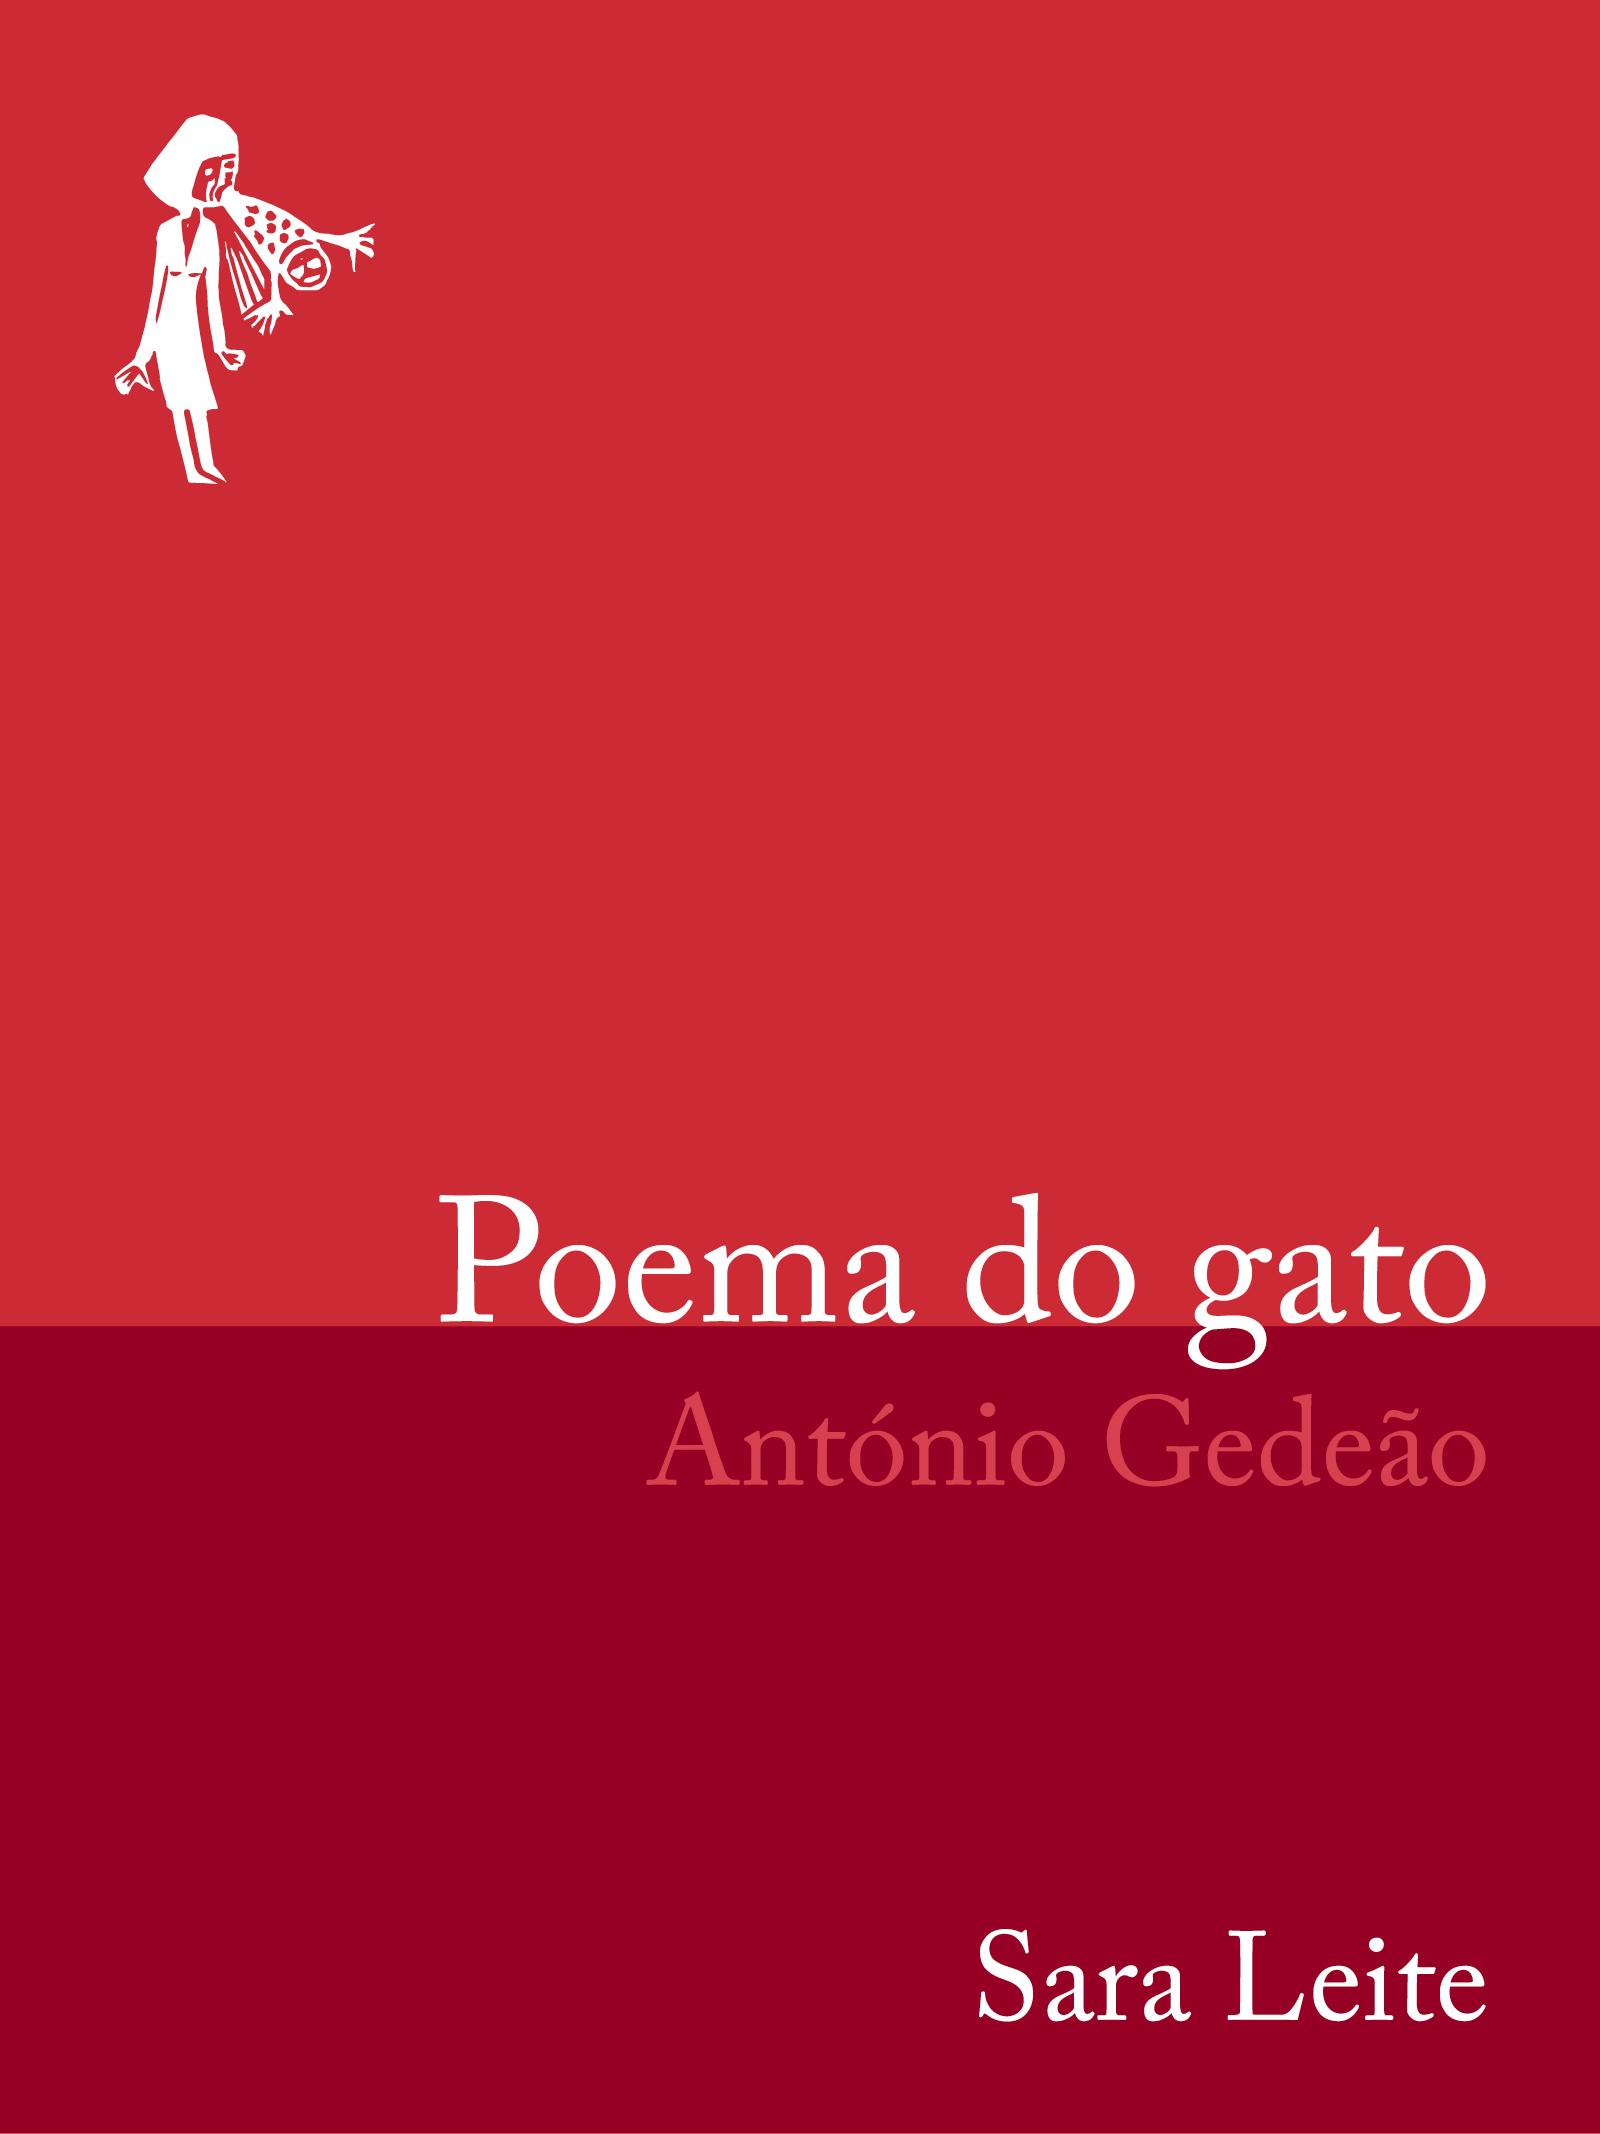 poemadogatoSL.jpg